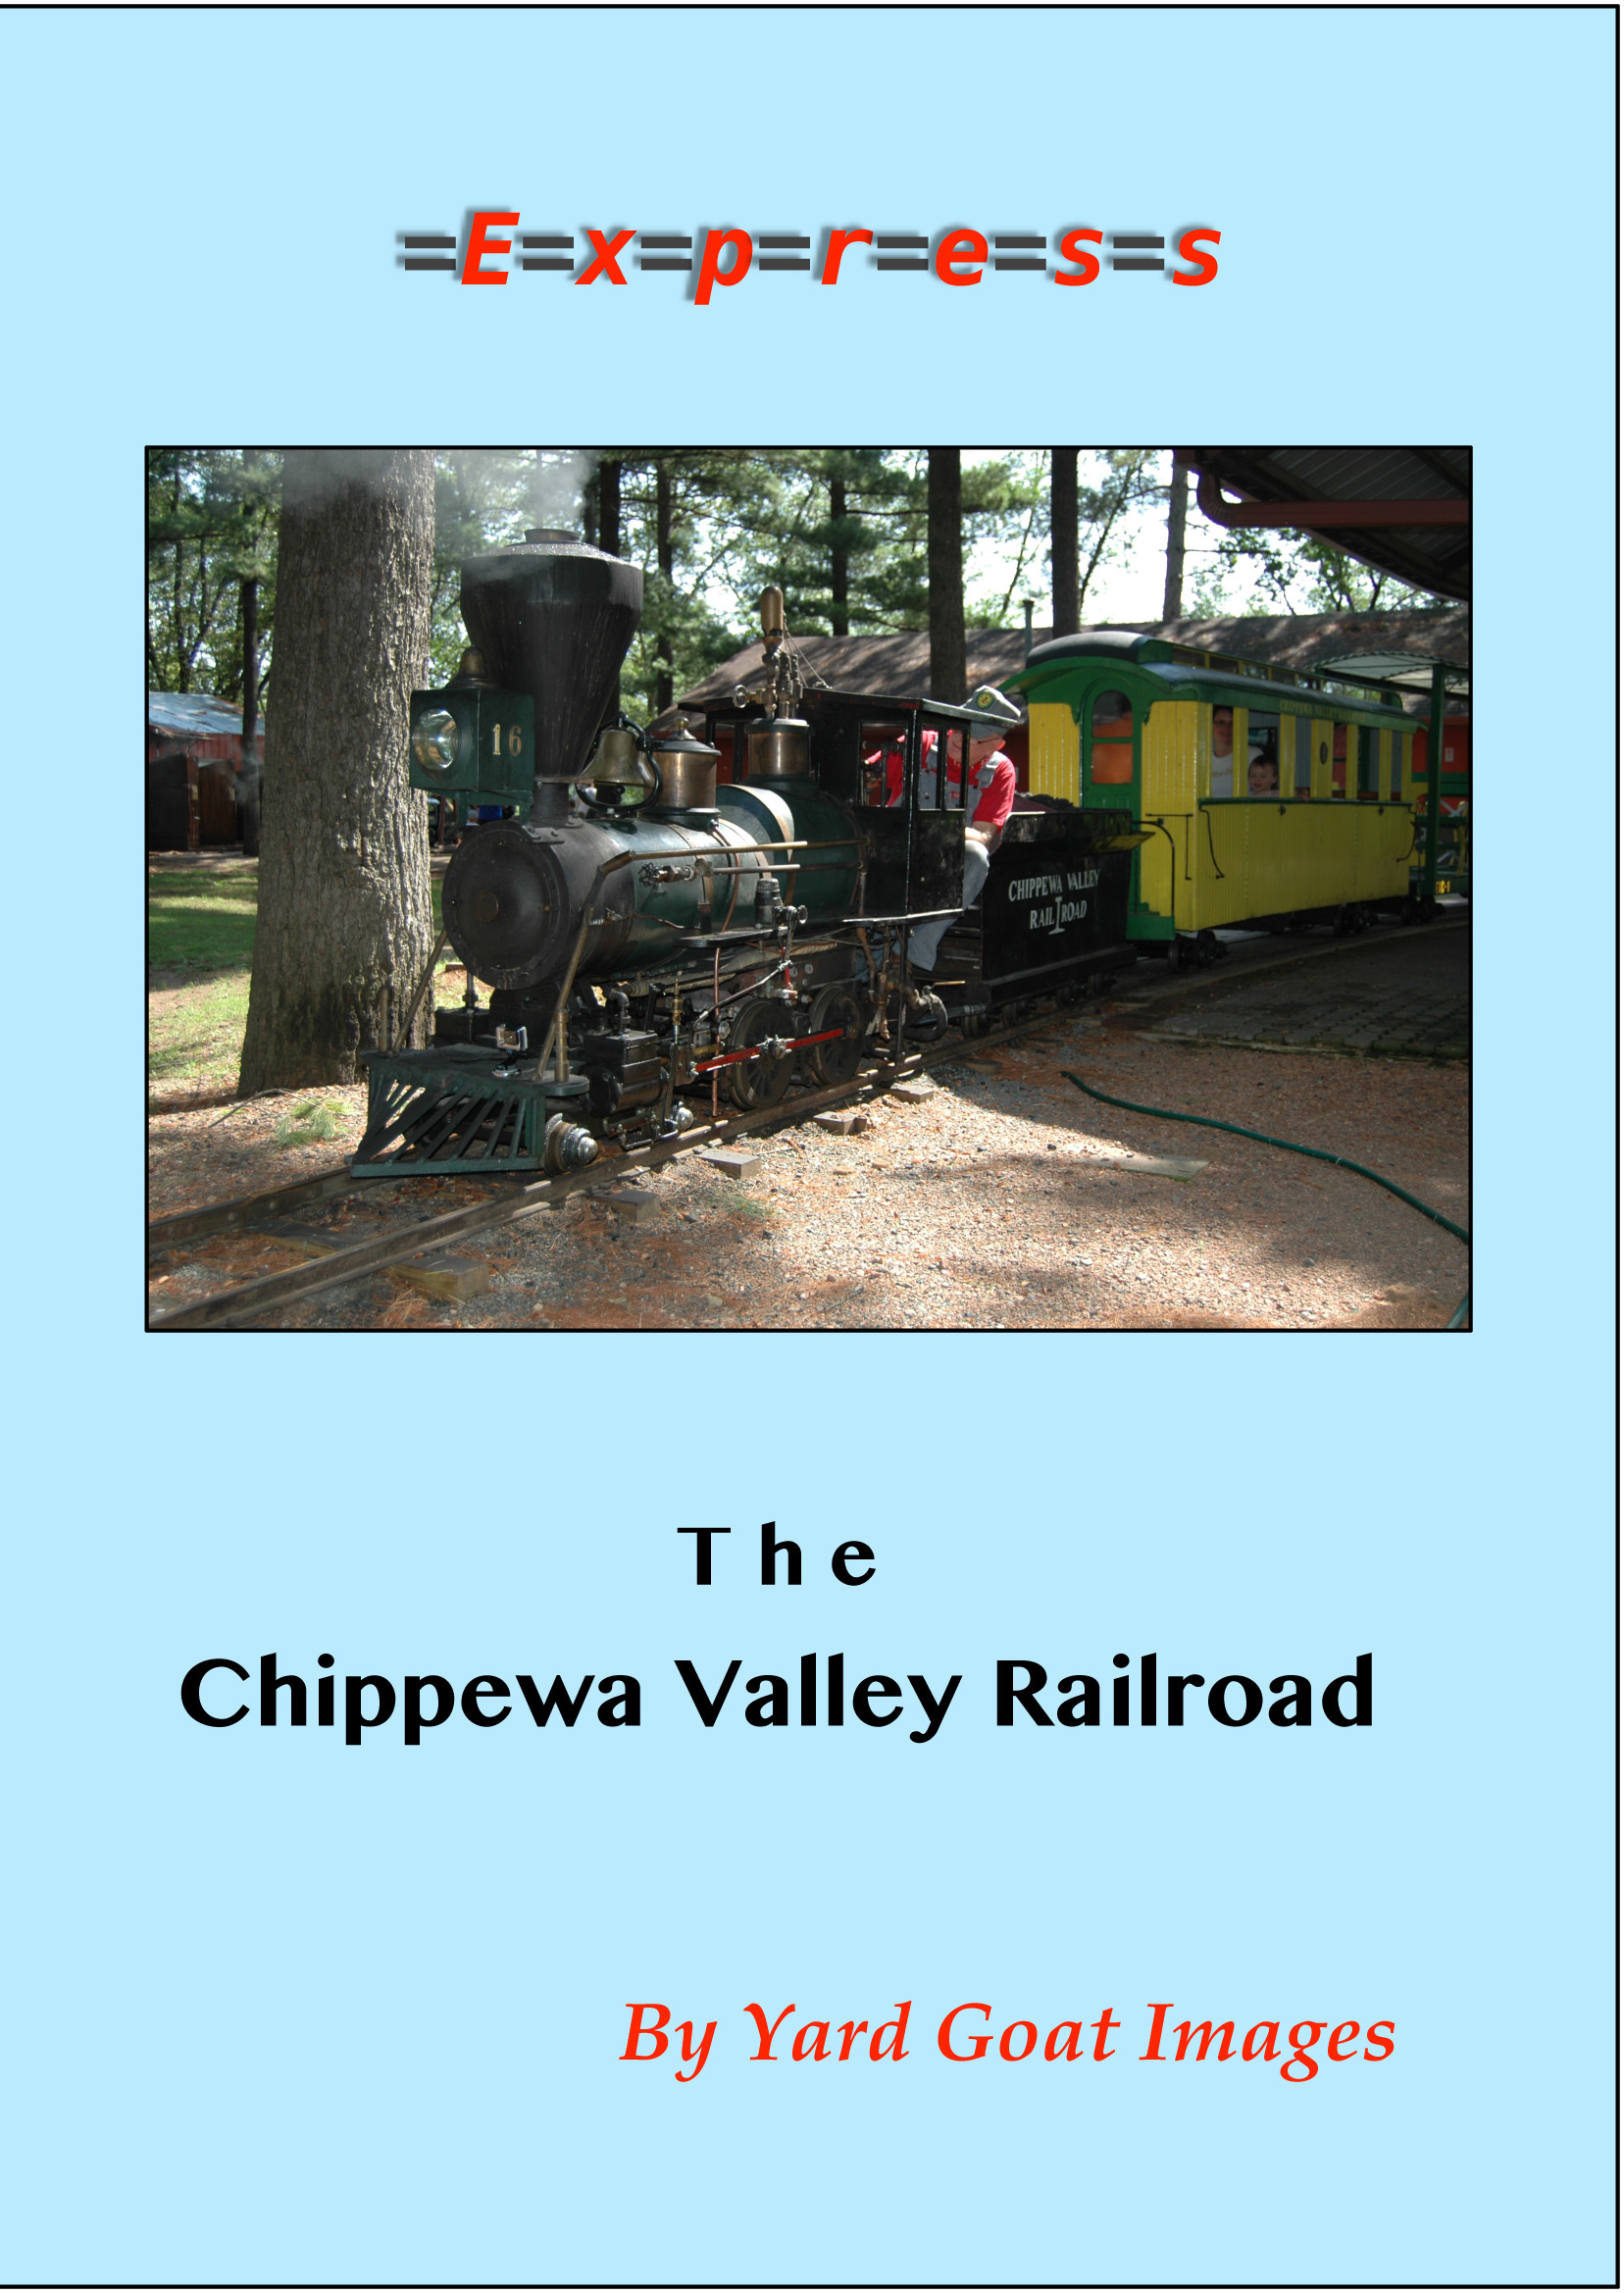 The Chippewa Valley Railroad EXPRESS 1517